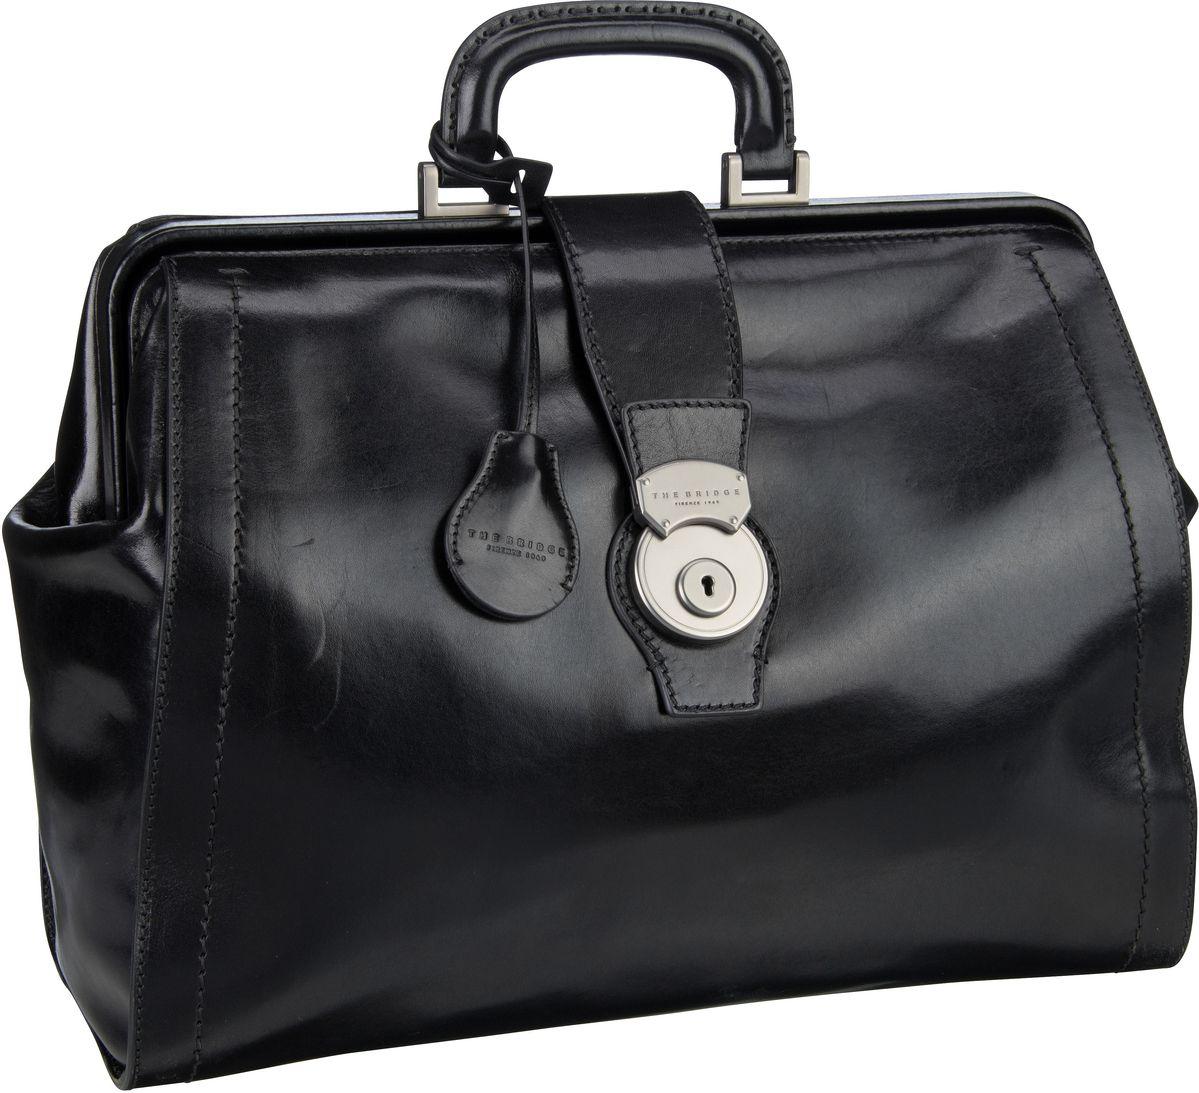 Handtasche Capalbio Arzttasche 2058 Nero/Rutenio Scuro